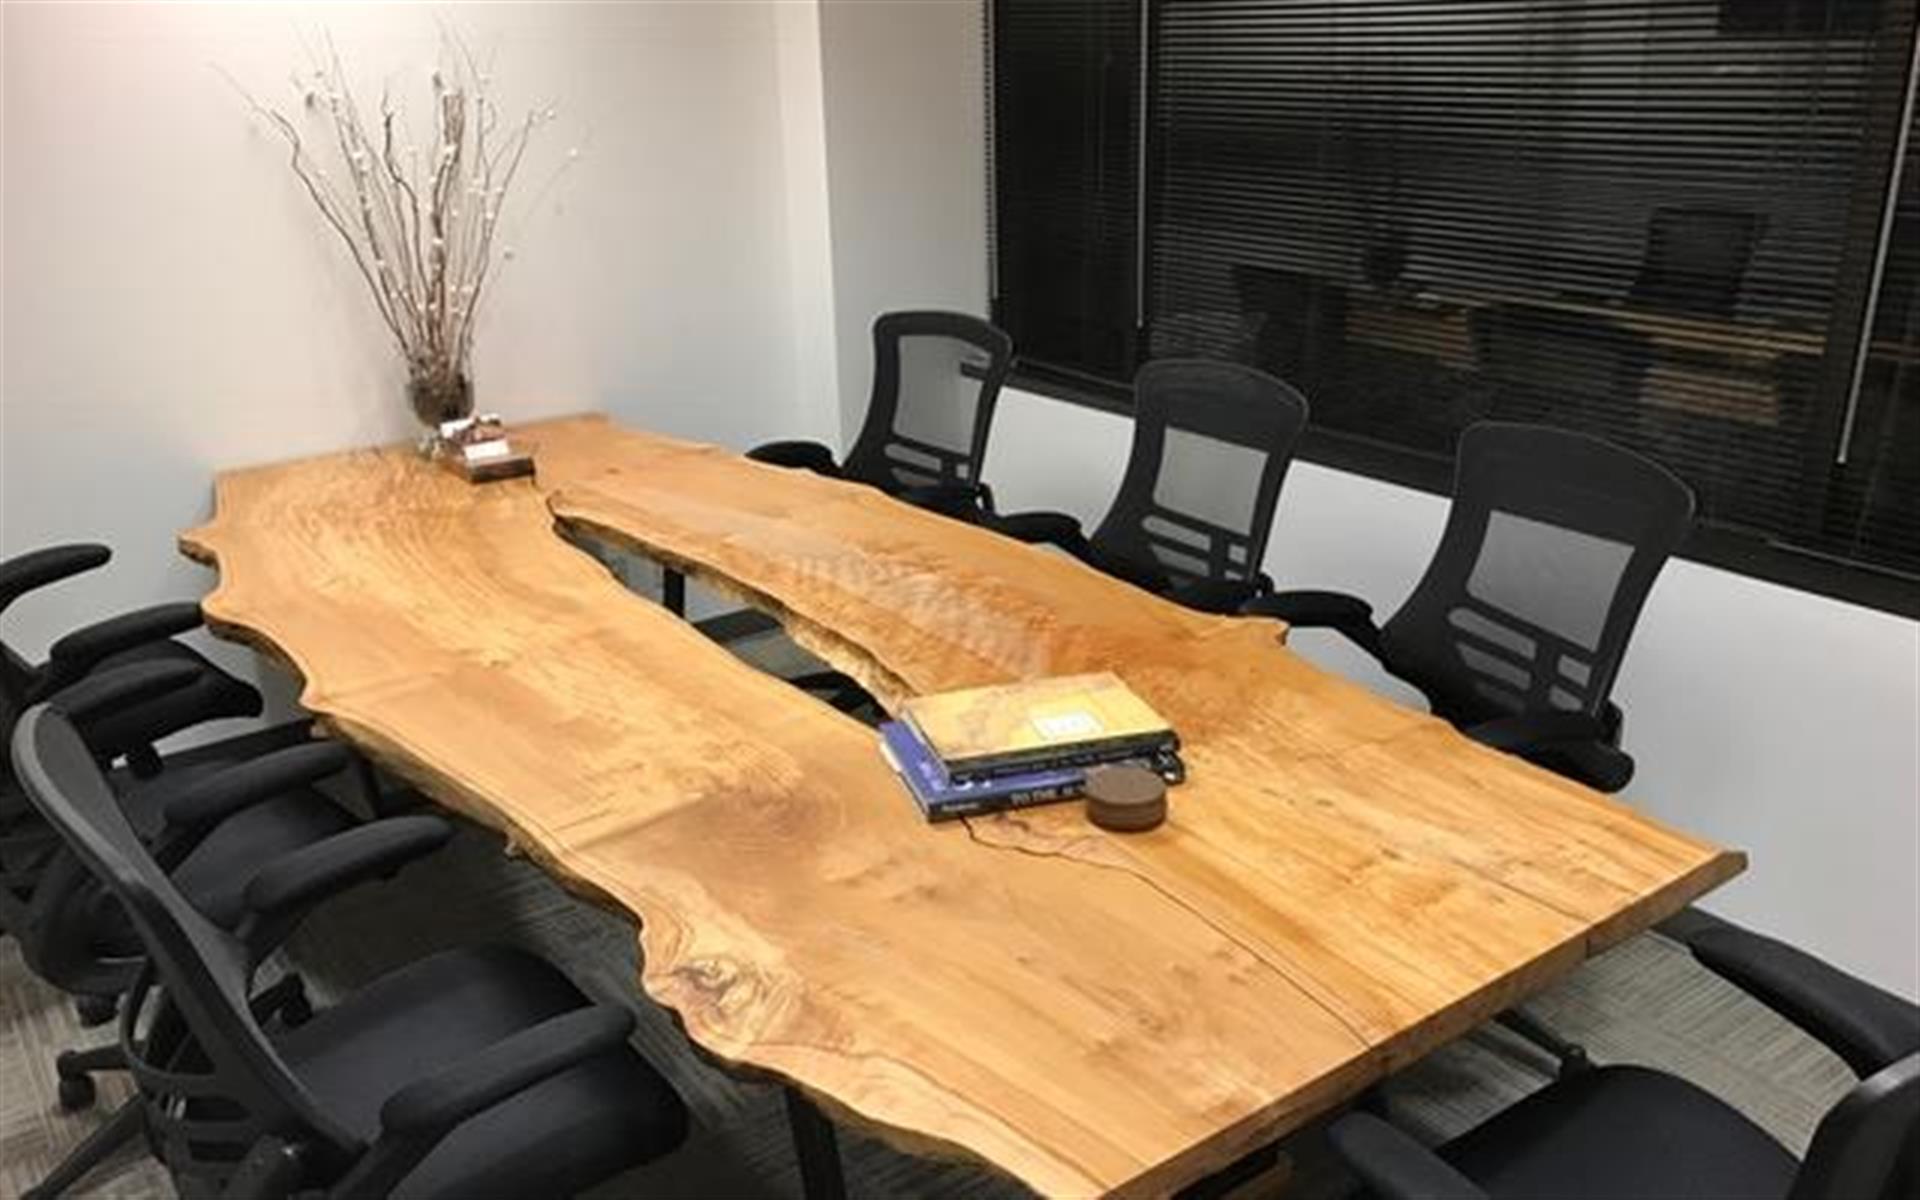 Office Space in Bellevue 405/520 Corridor - Conference Room & CoWorking Space